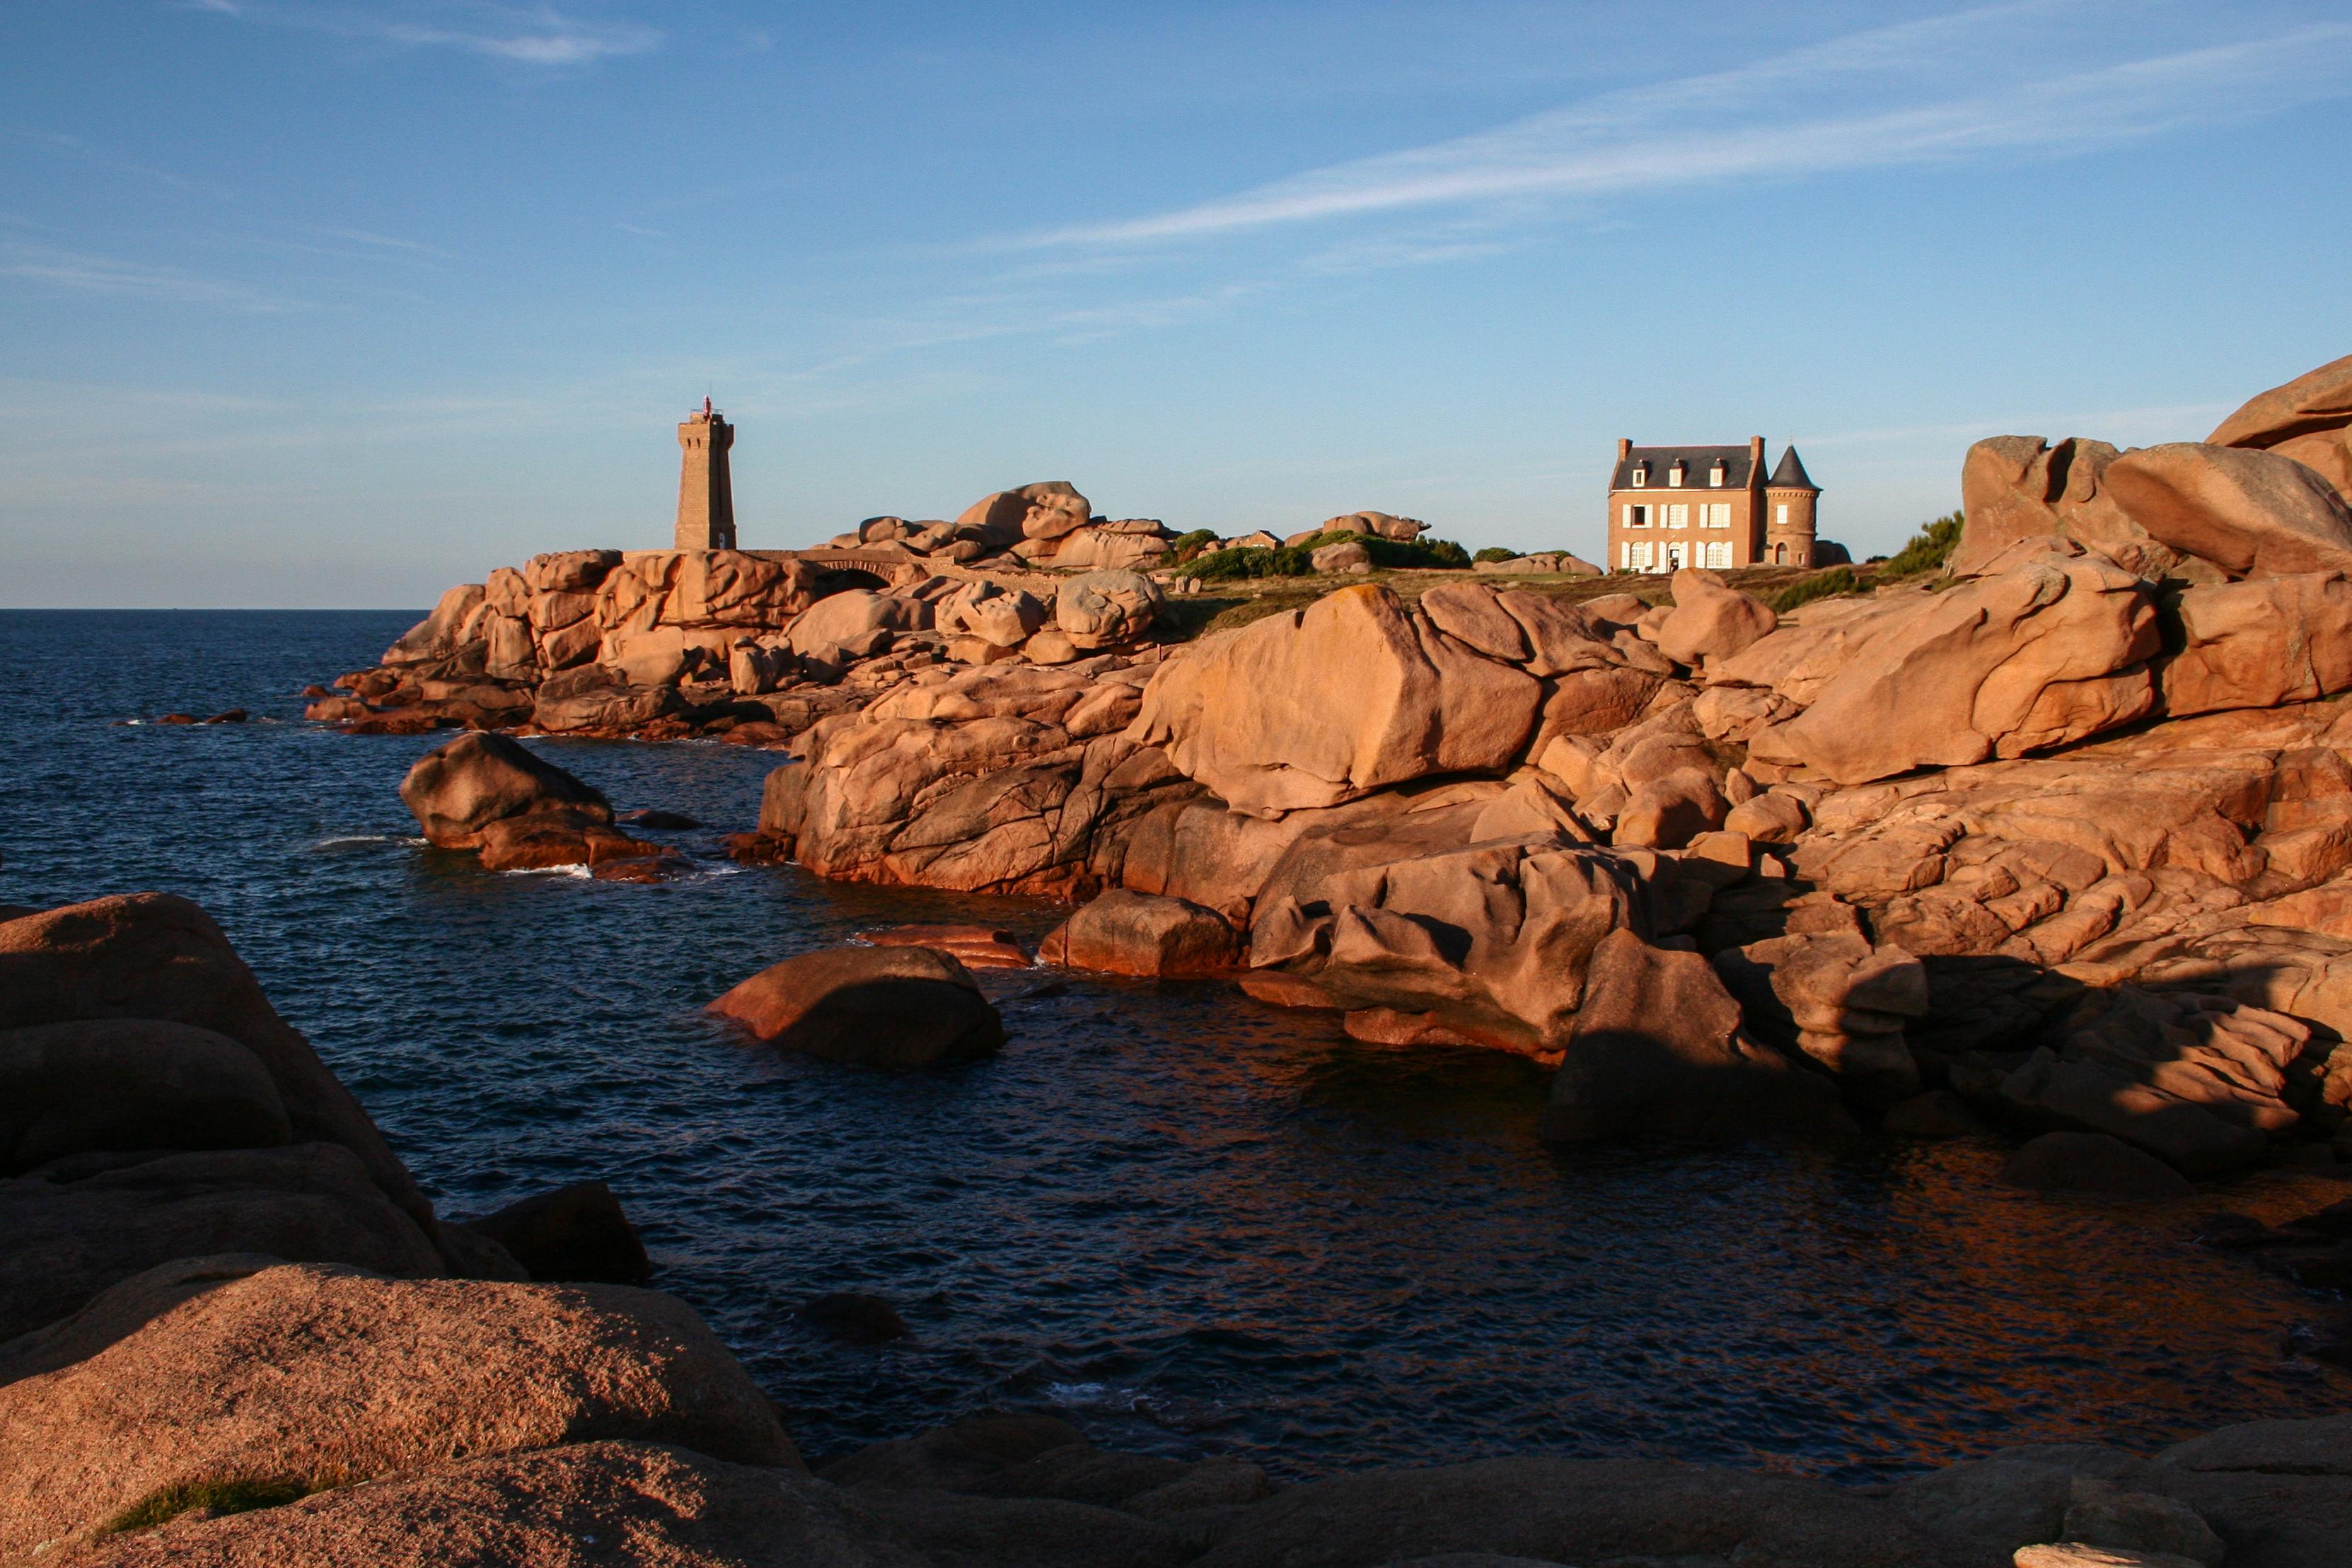 File:Côte de granite rose à Ploumanac\'h (phare de Ploumanac\'h).JPG ...